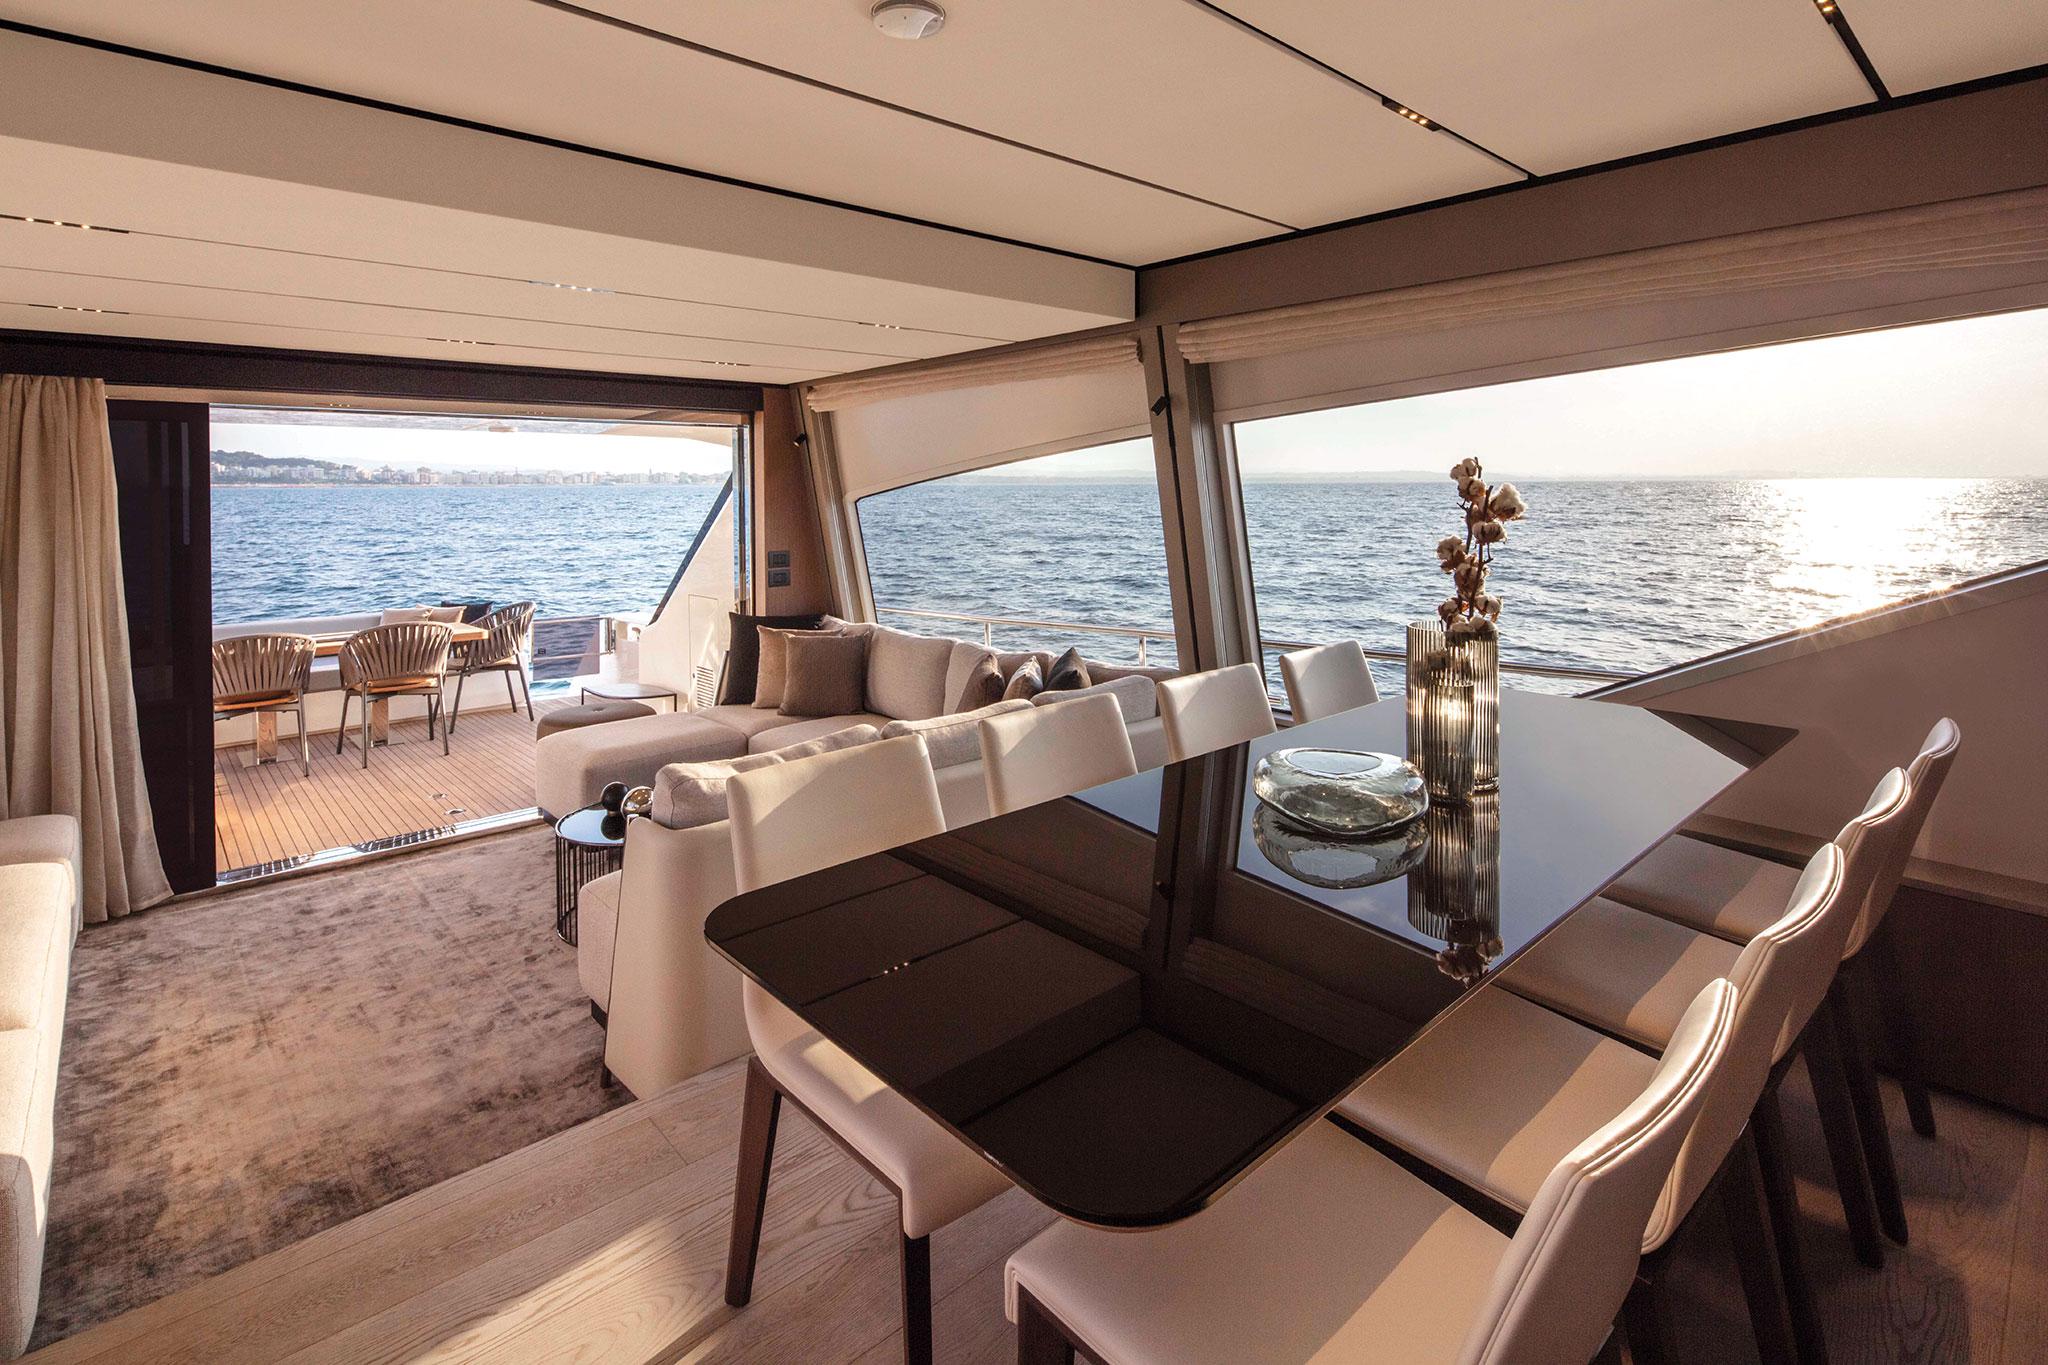 ferretti-Yachts-720-salon_2-yachts-france-173